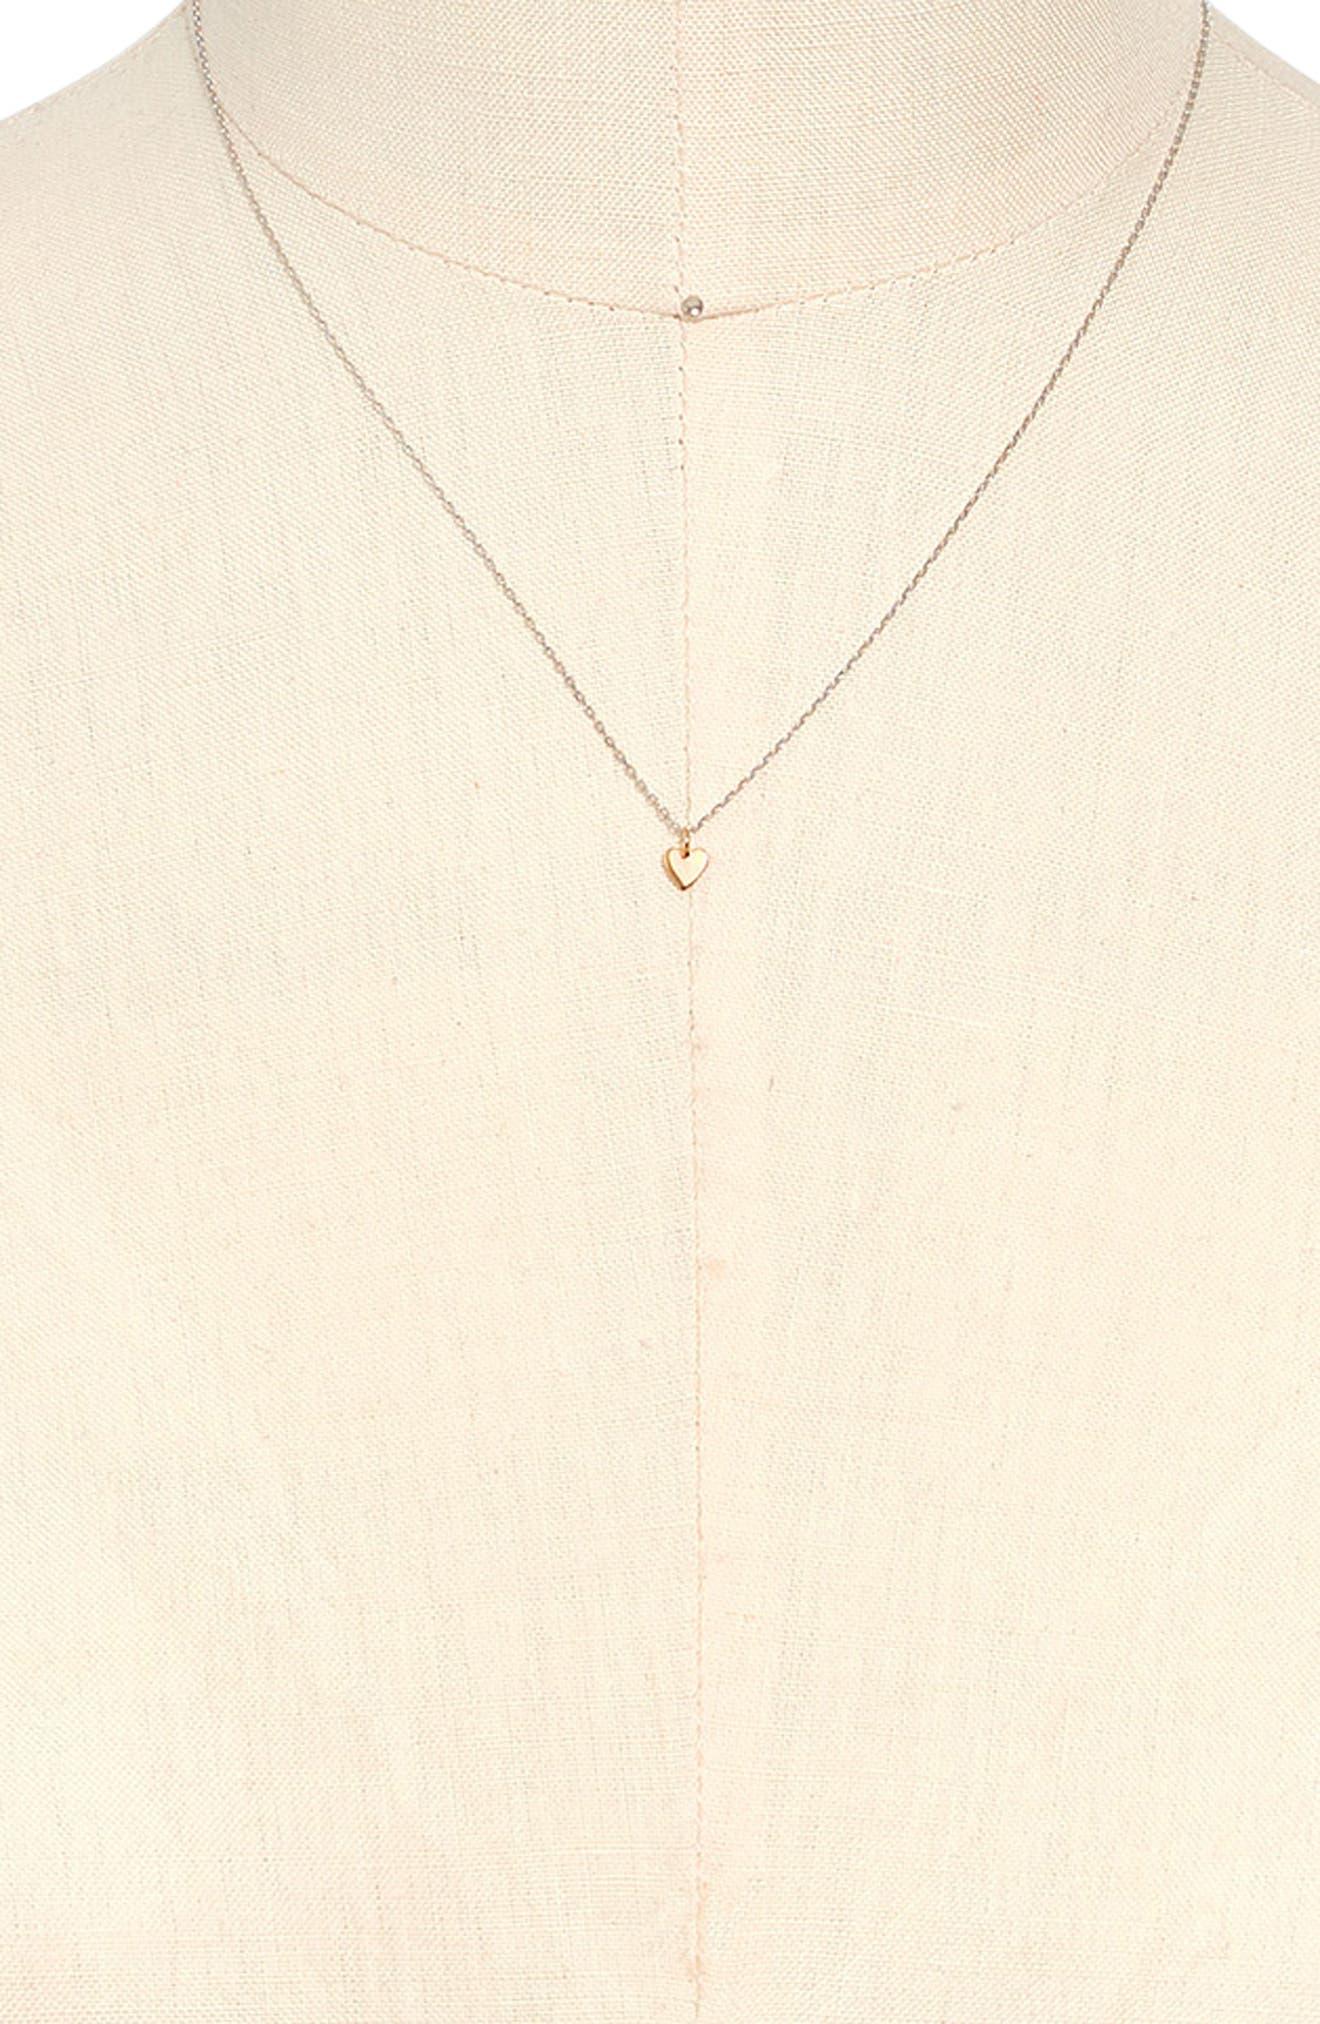 MADEWELL, Vermeil Pendant Necklace, Alternate thumbnail 2, color, 710